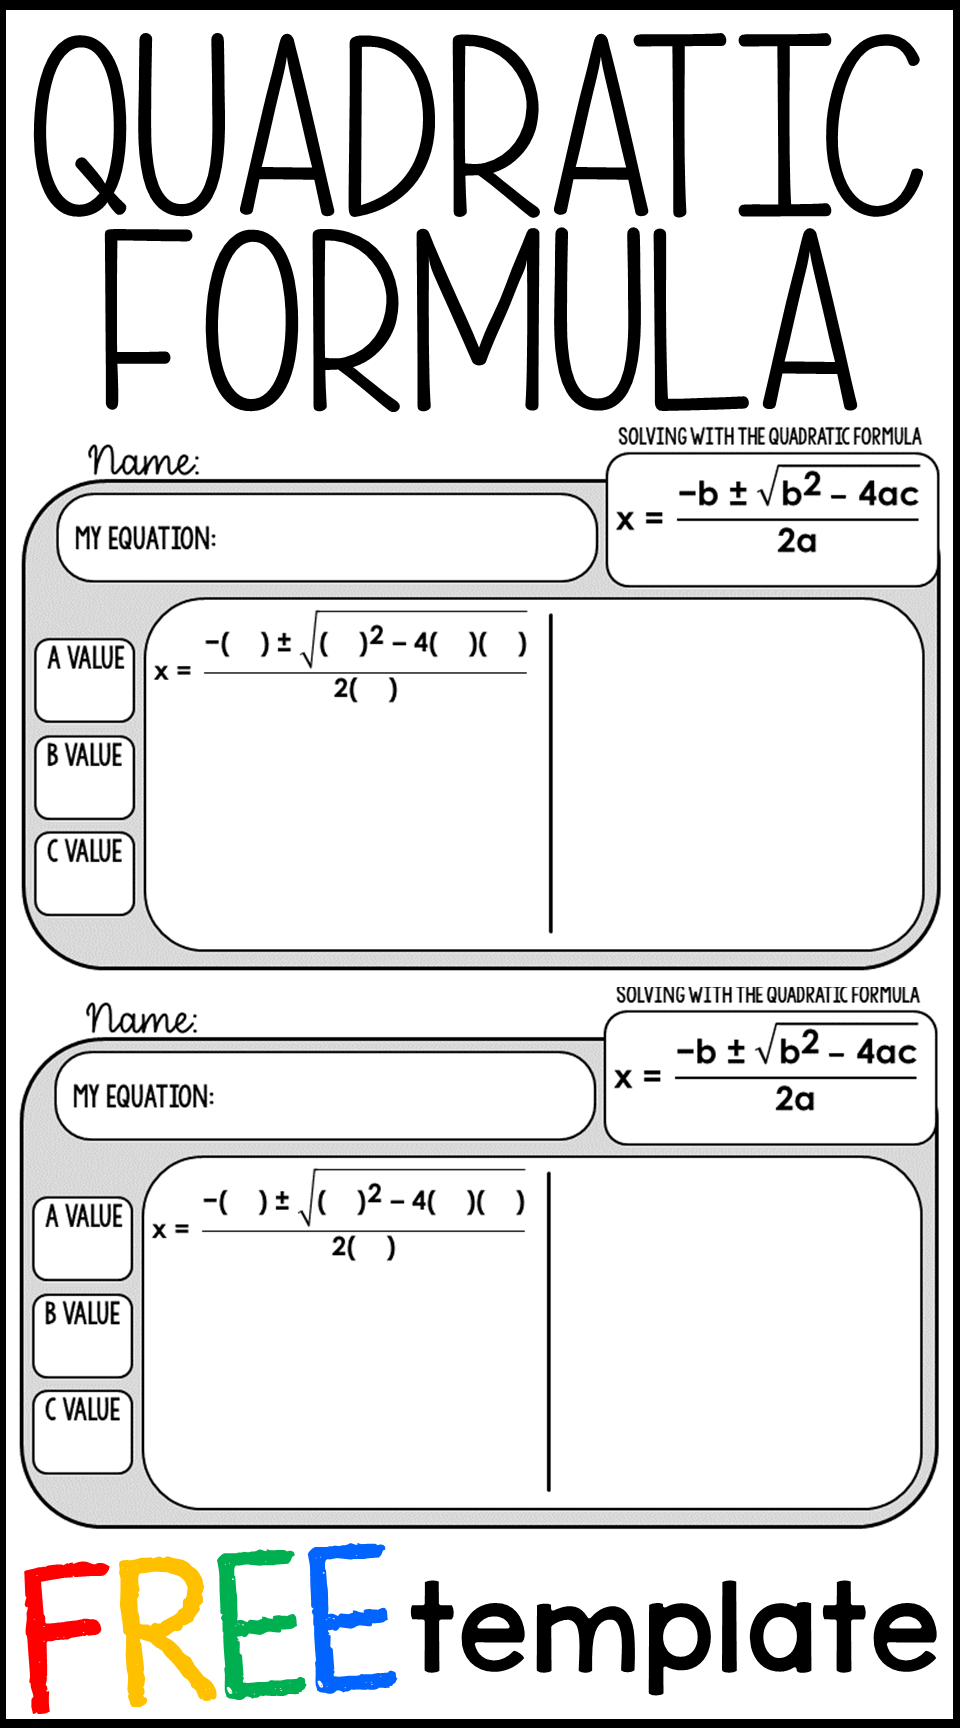 Free Quadratic Formula Warm Up Template Teaching Algebra School Algebra Math Lessons [ 1728 x 960 Pixel ]